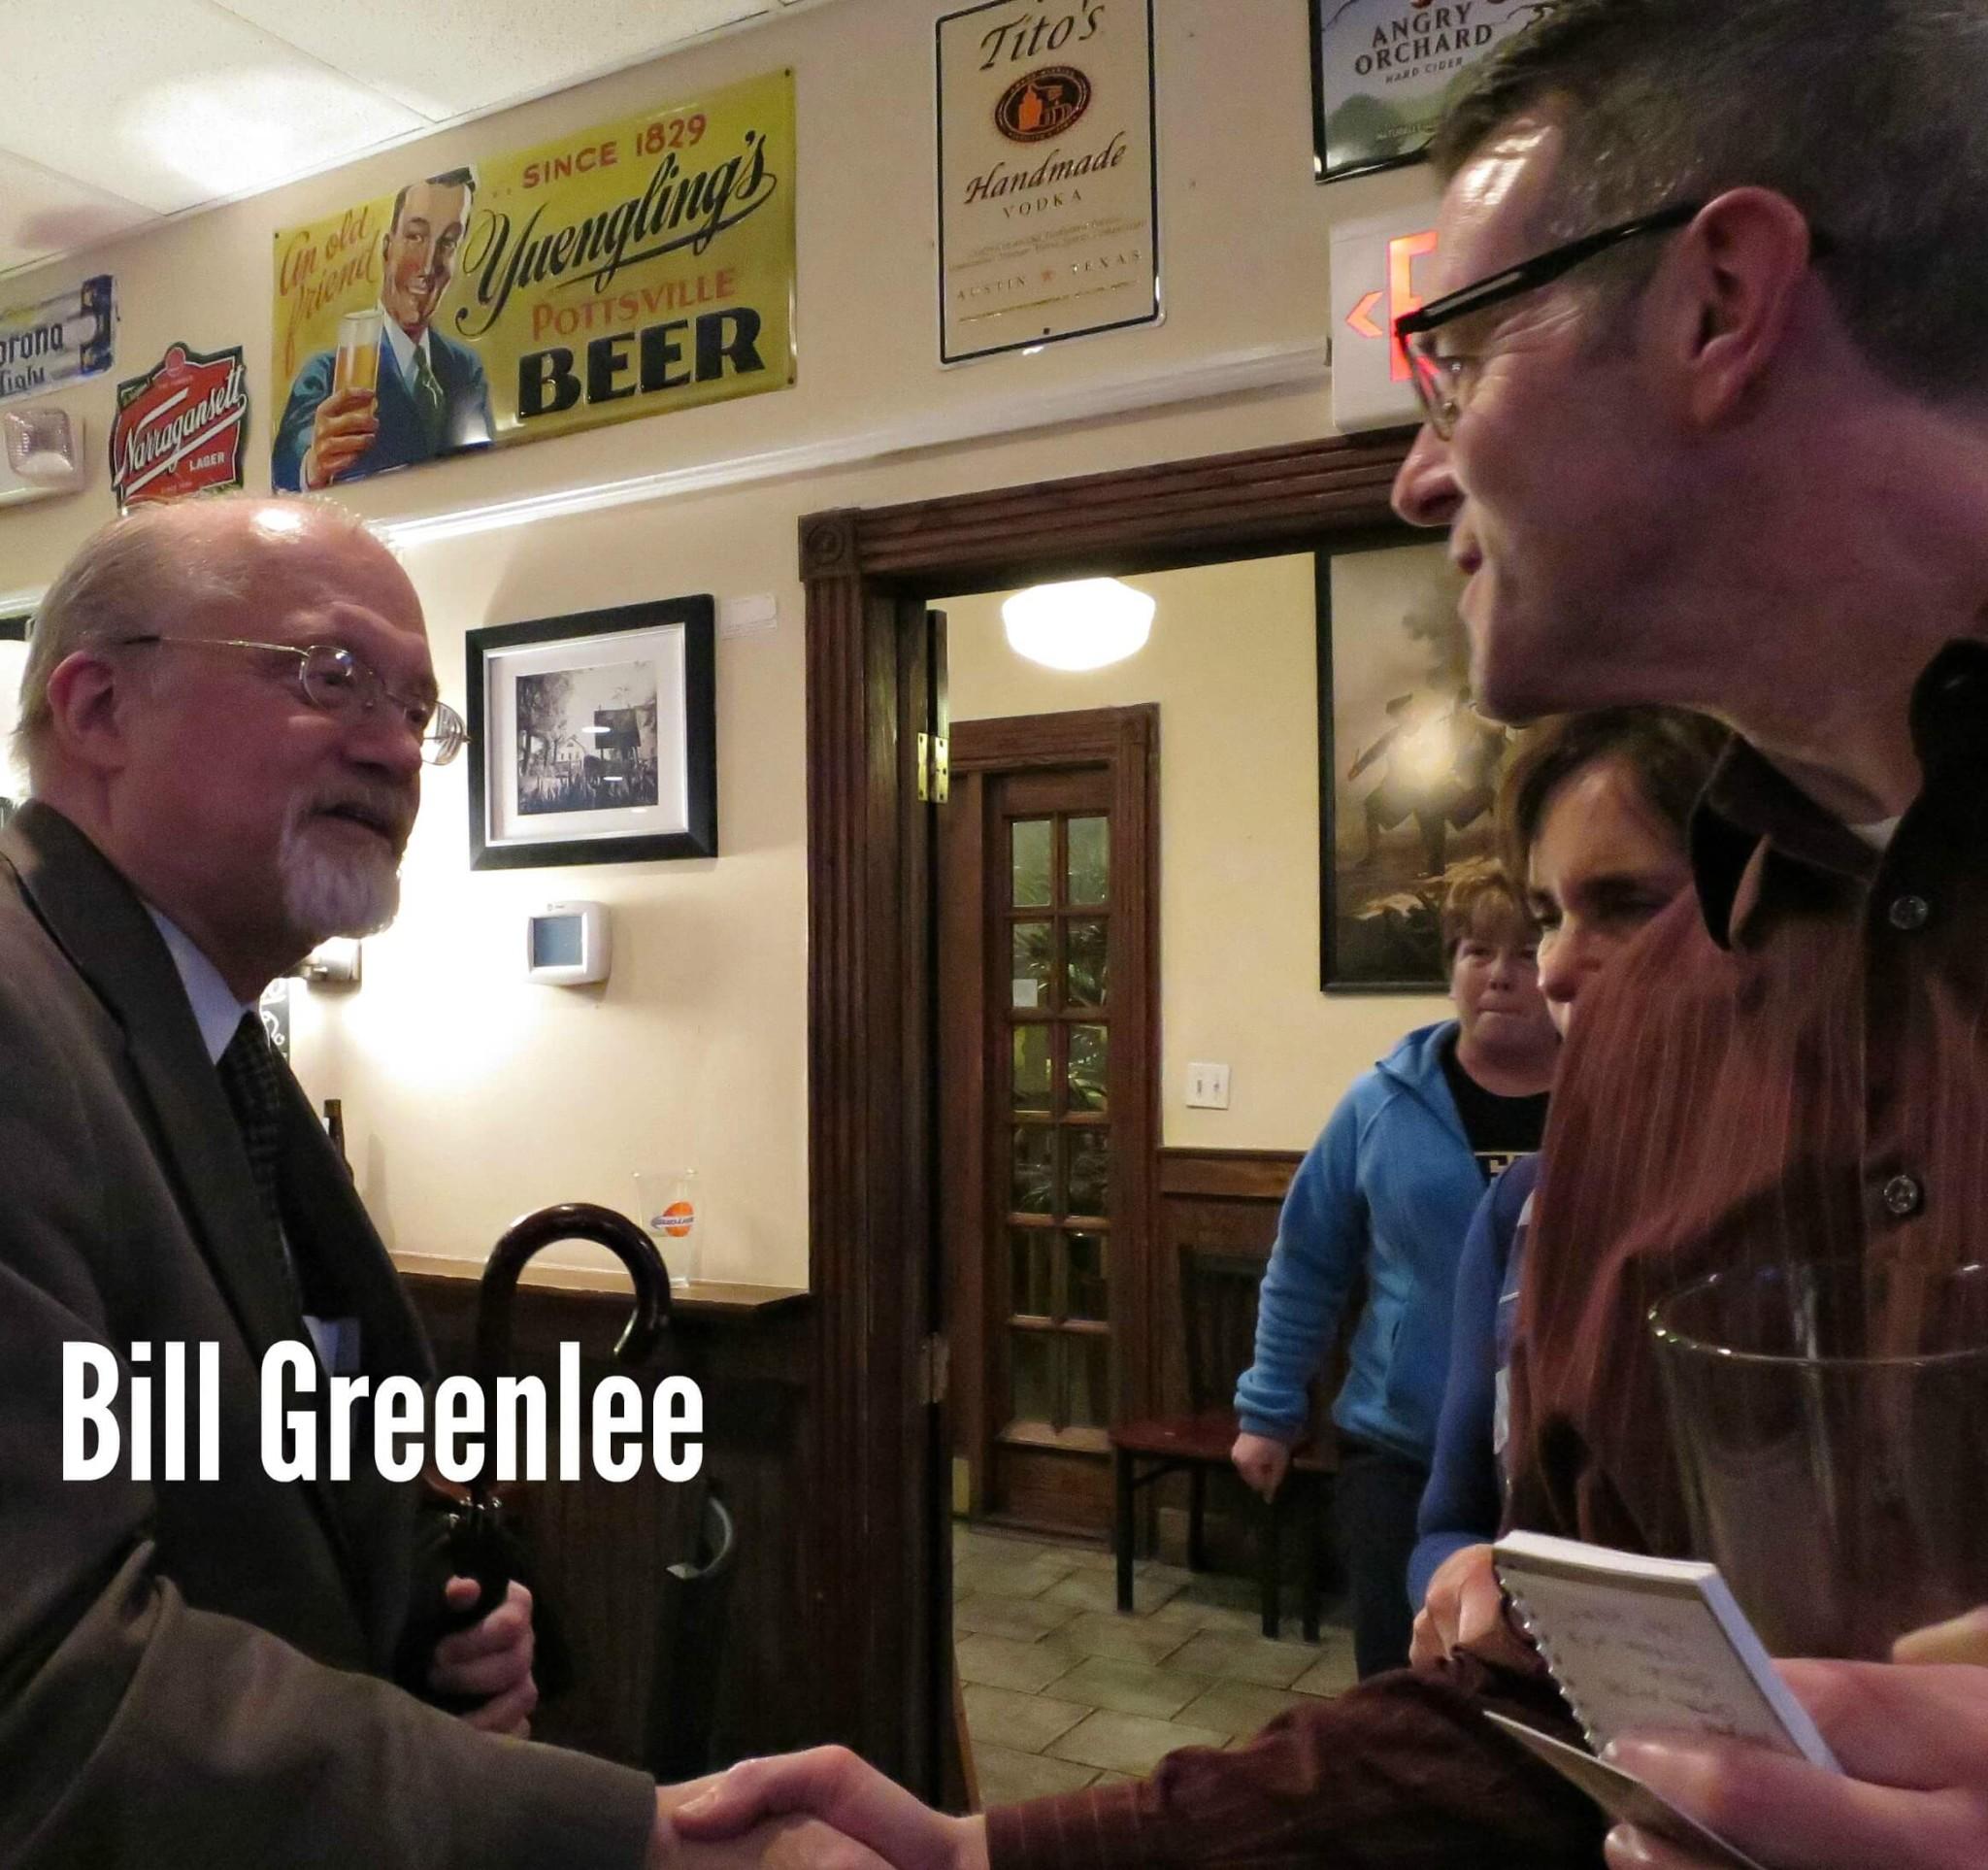 EastFallsLocal steve shakes hands Bill Greenlee